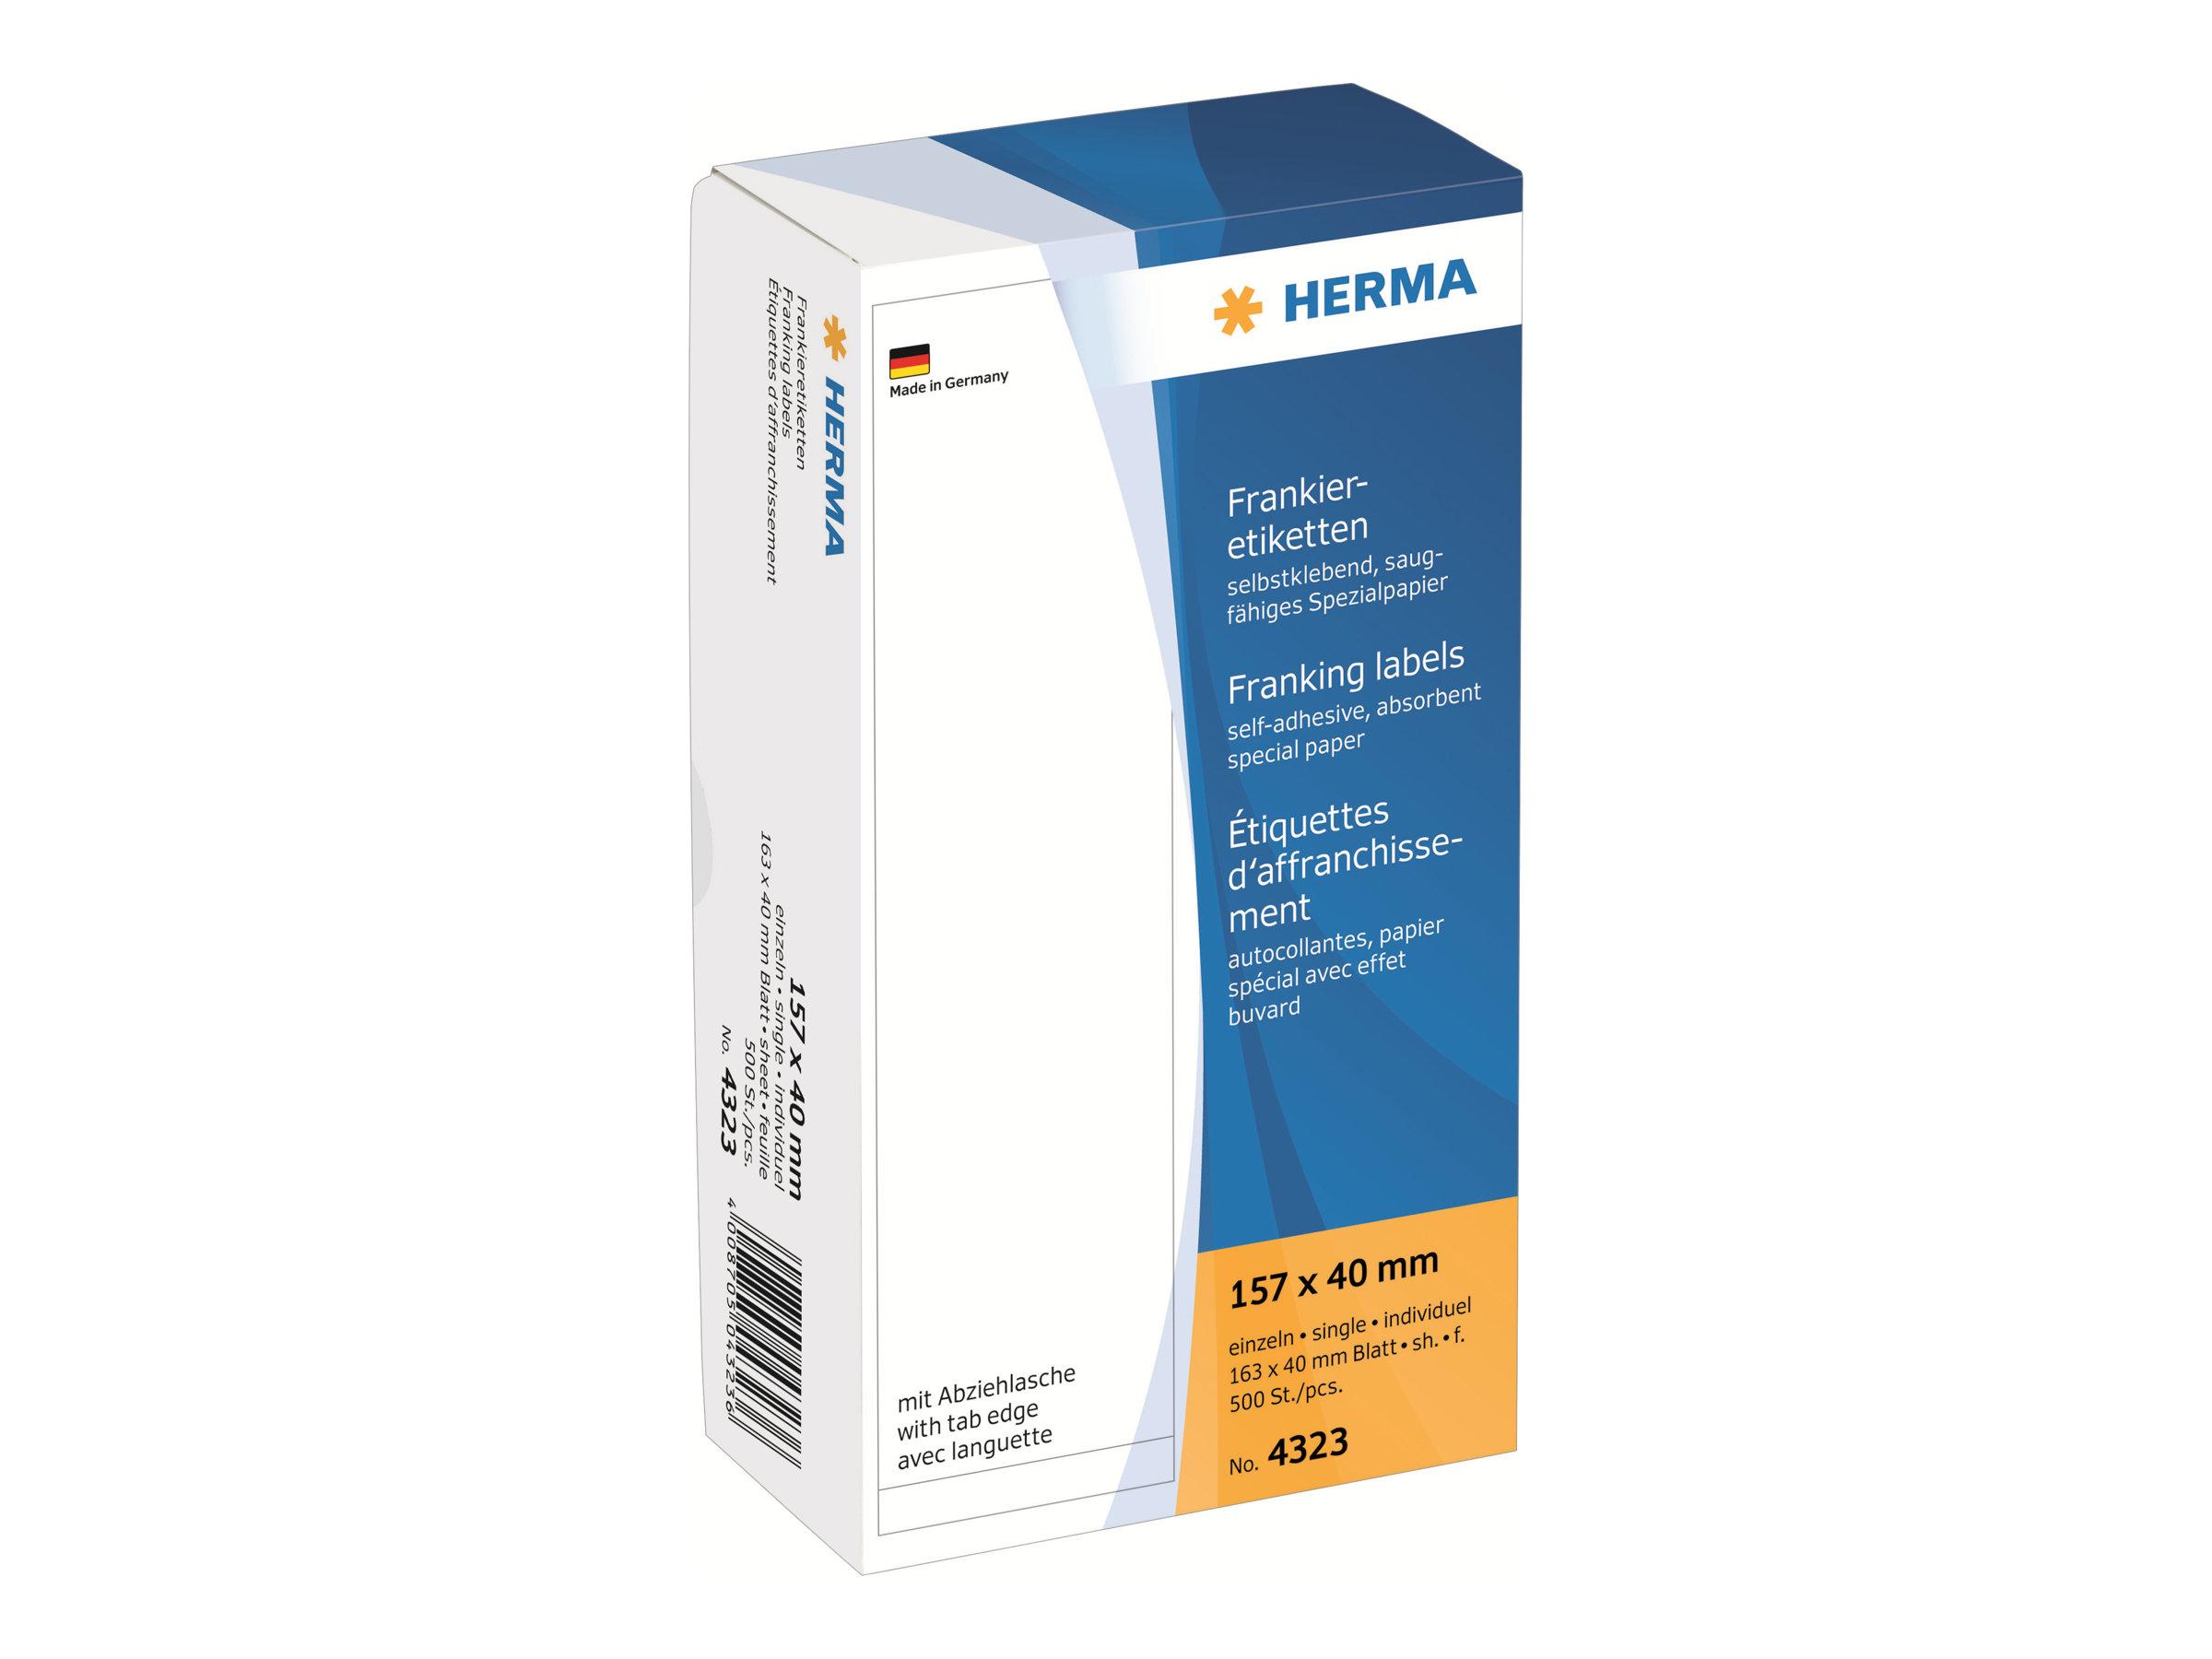 HERMA Franking labels - Papier